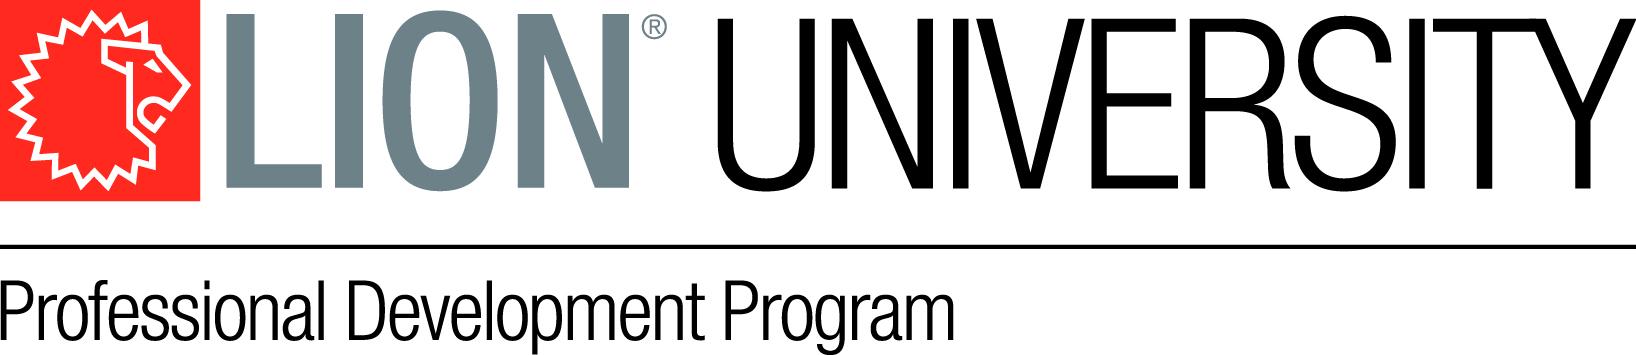 LION-University-logo.jpg